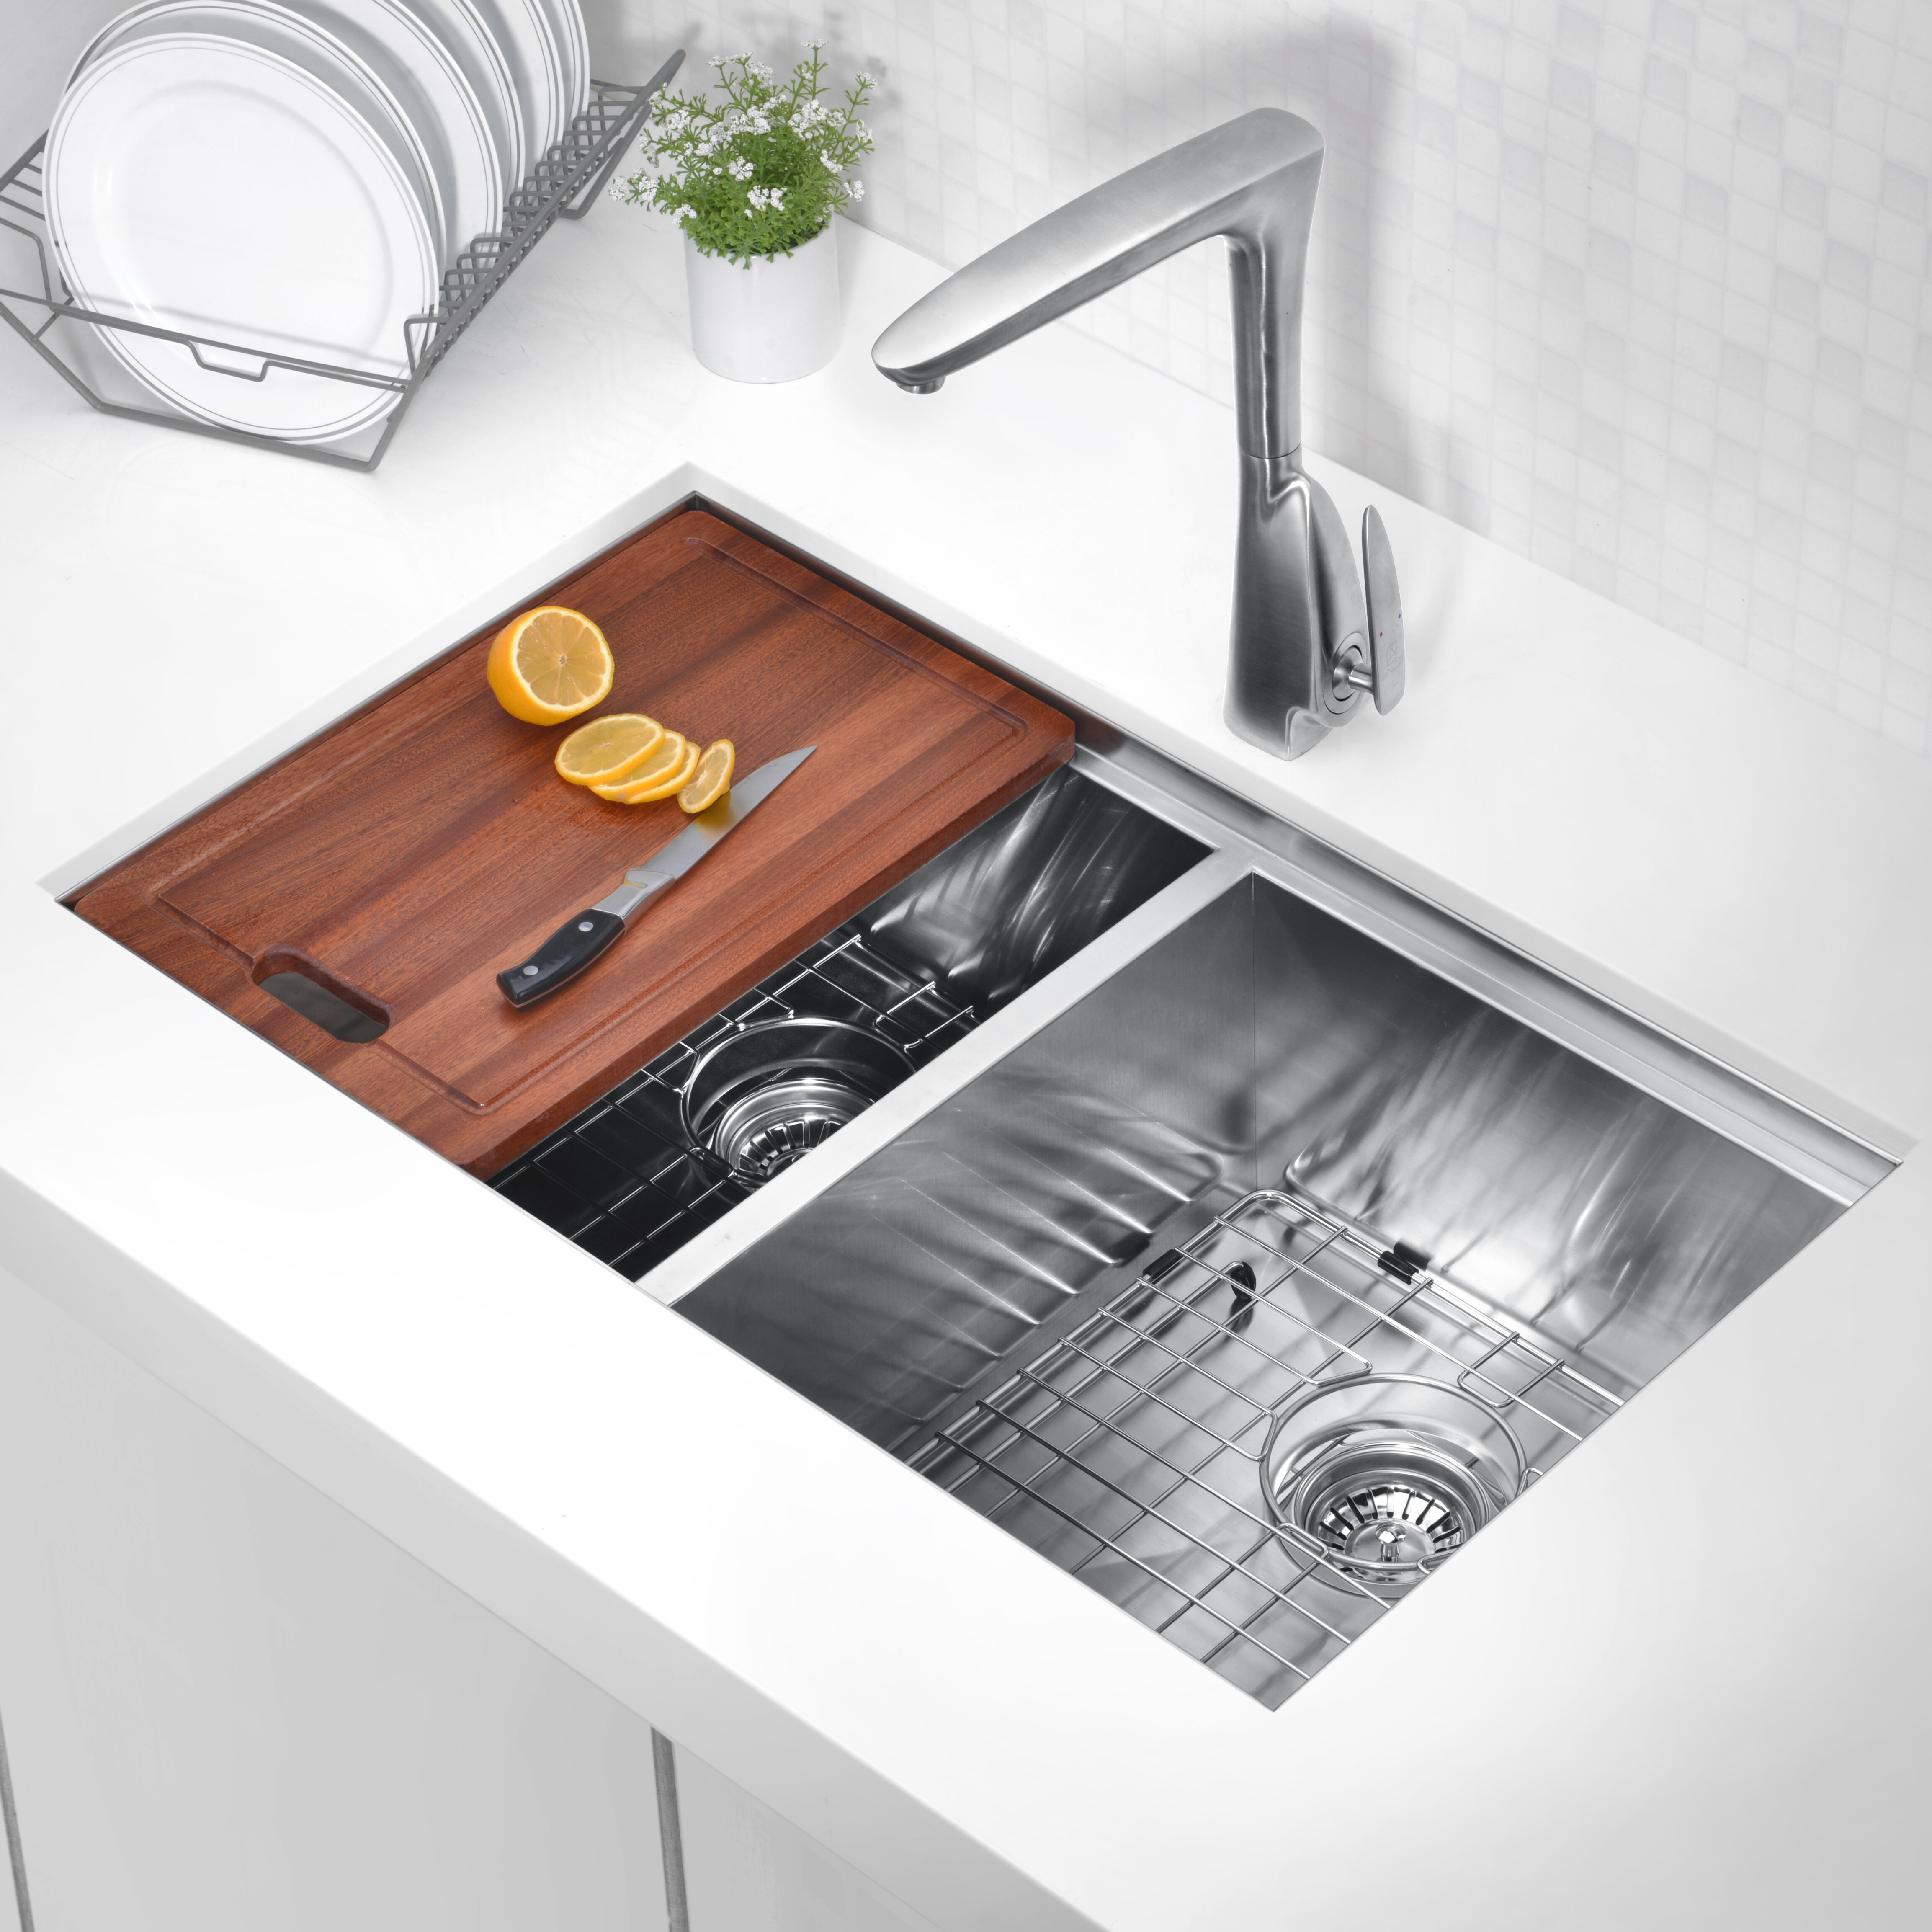 Anzzi Aegis 33 L X 19 W Double Basin Undermount Kitchen Sink With Cutting Board And Colander Wayfair